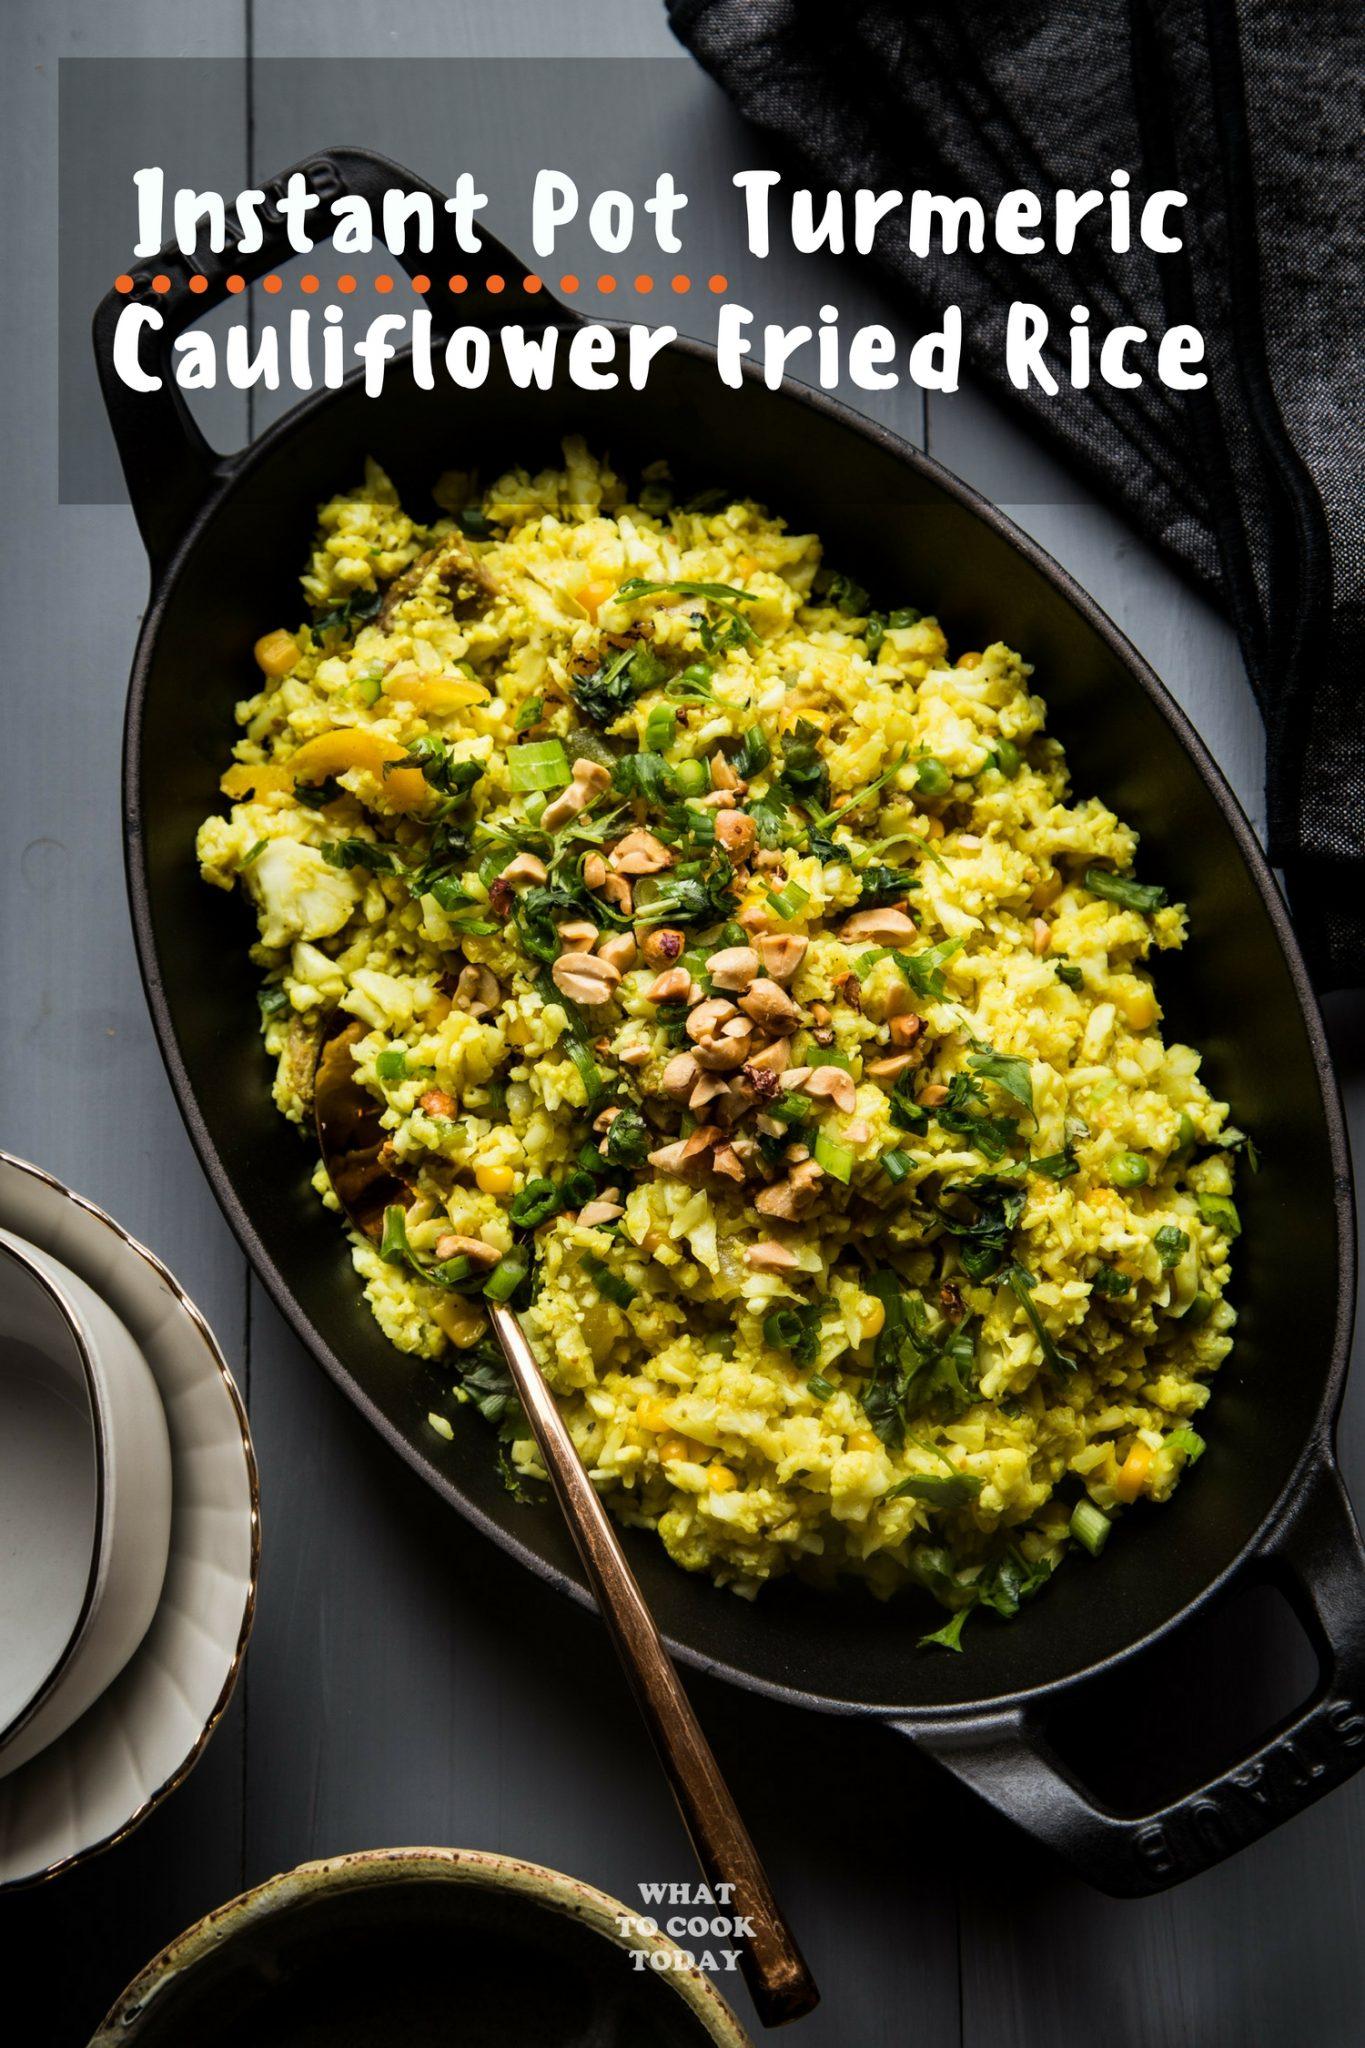 Turmeric Cauliflower Fried Rice #instantpot #thanksgivingleftover #caulirice #cauliflower #easyrecipes #turmeric